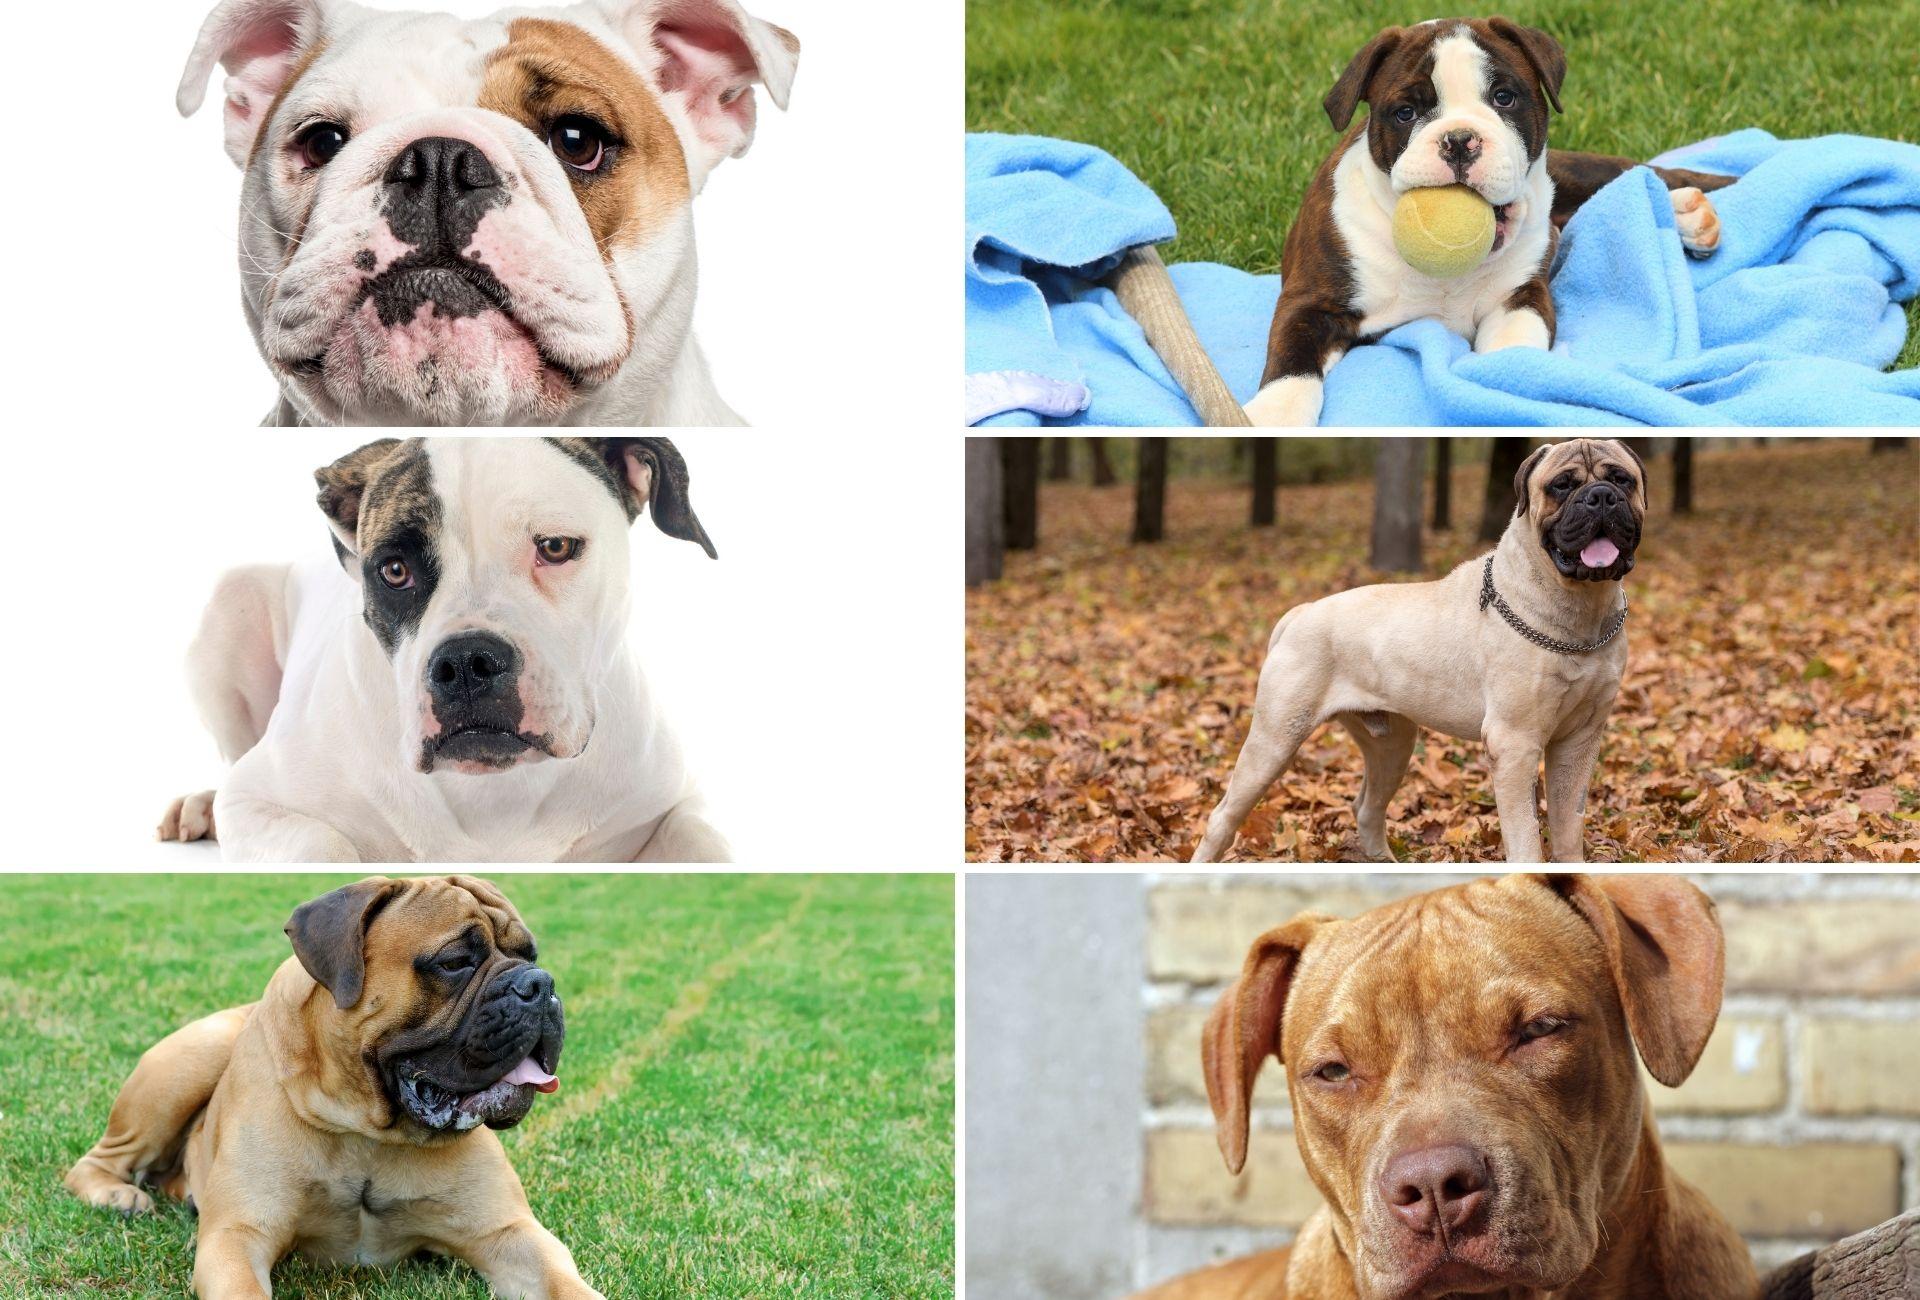 Snapshots of six breeds that went into the Renascence Bulldogge's creation which include the British Bulldog, Hermes OEB, American Bulldog, Bullmastiff, English Mastiff, and Pitbull bloodlines.